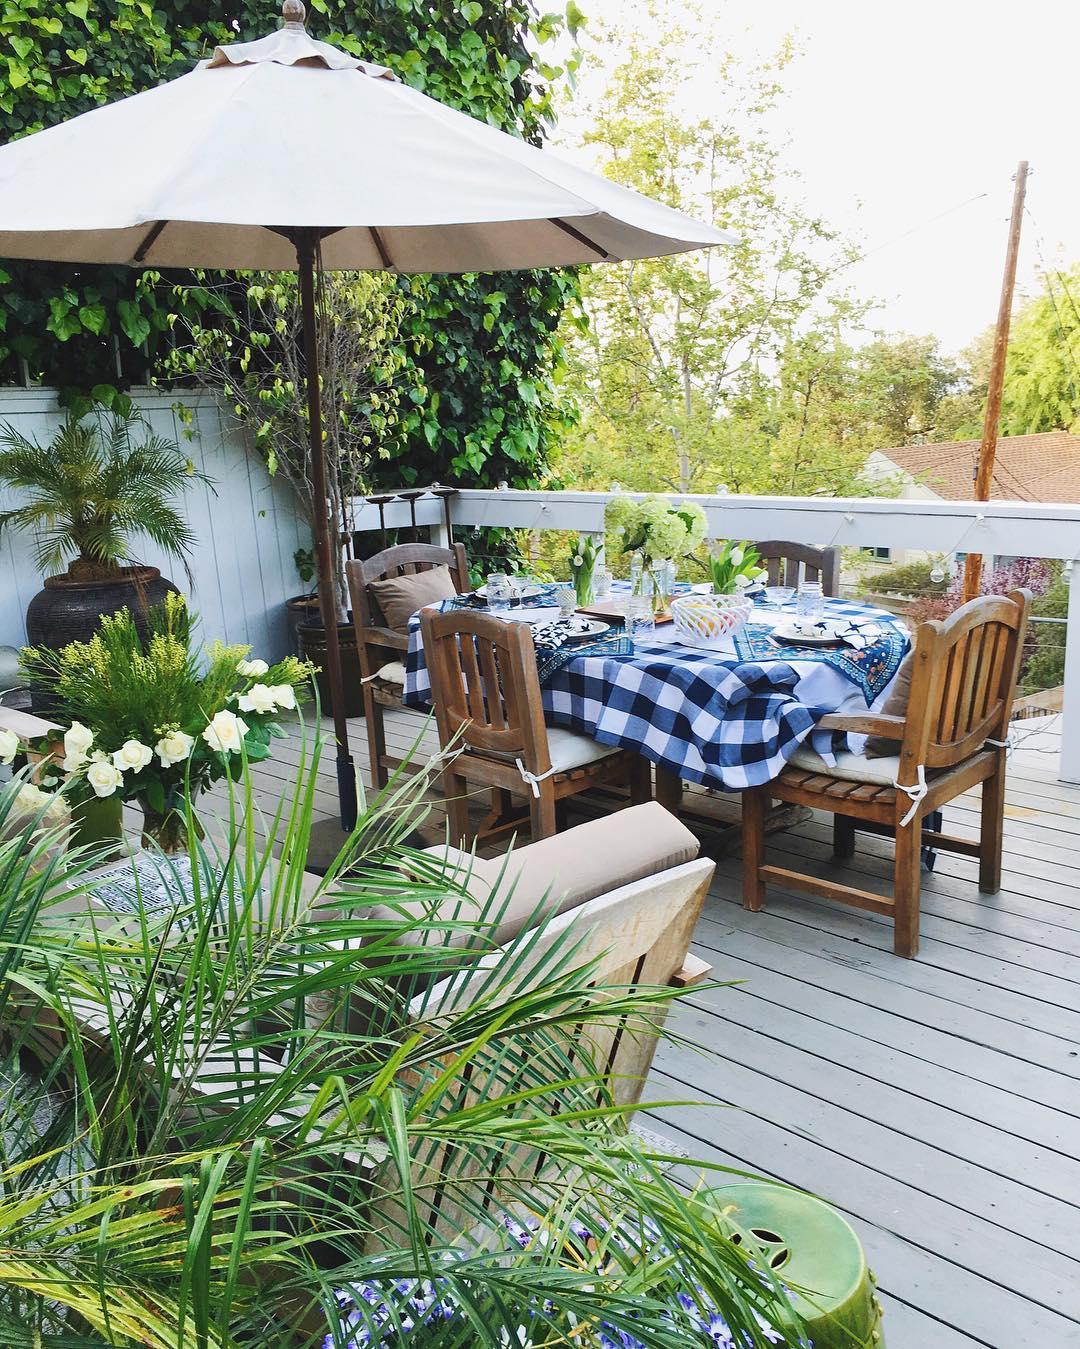 23+ Simple Patio Designs, Decorating Ideas | Design Trends ... on Backyard Patio Designs  id=21339